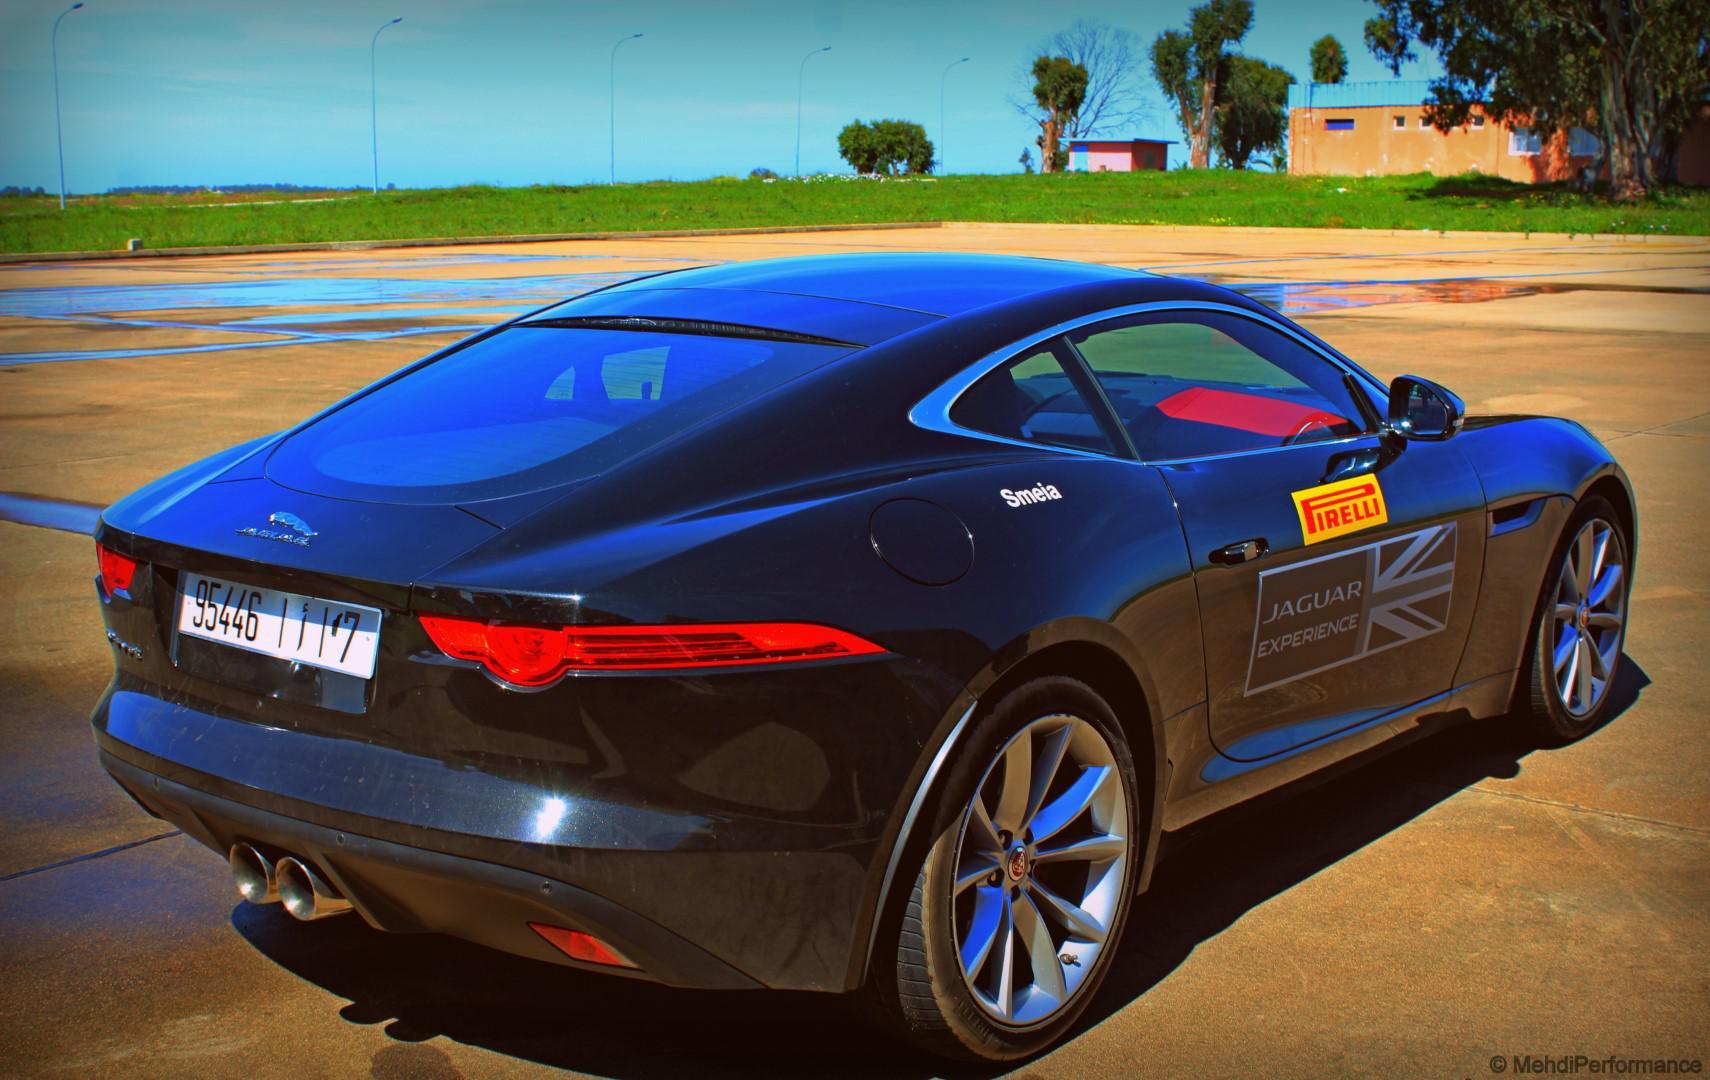 jaguar-amp-land-rover-experience-734-5.jpg